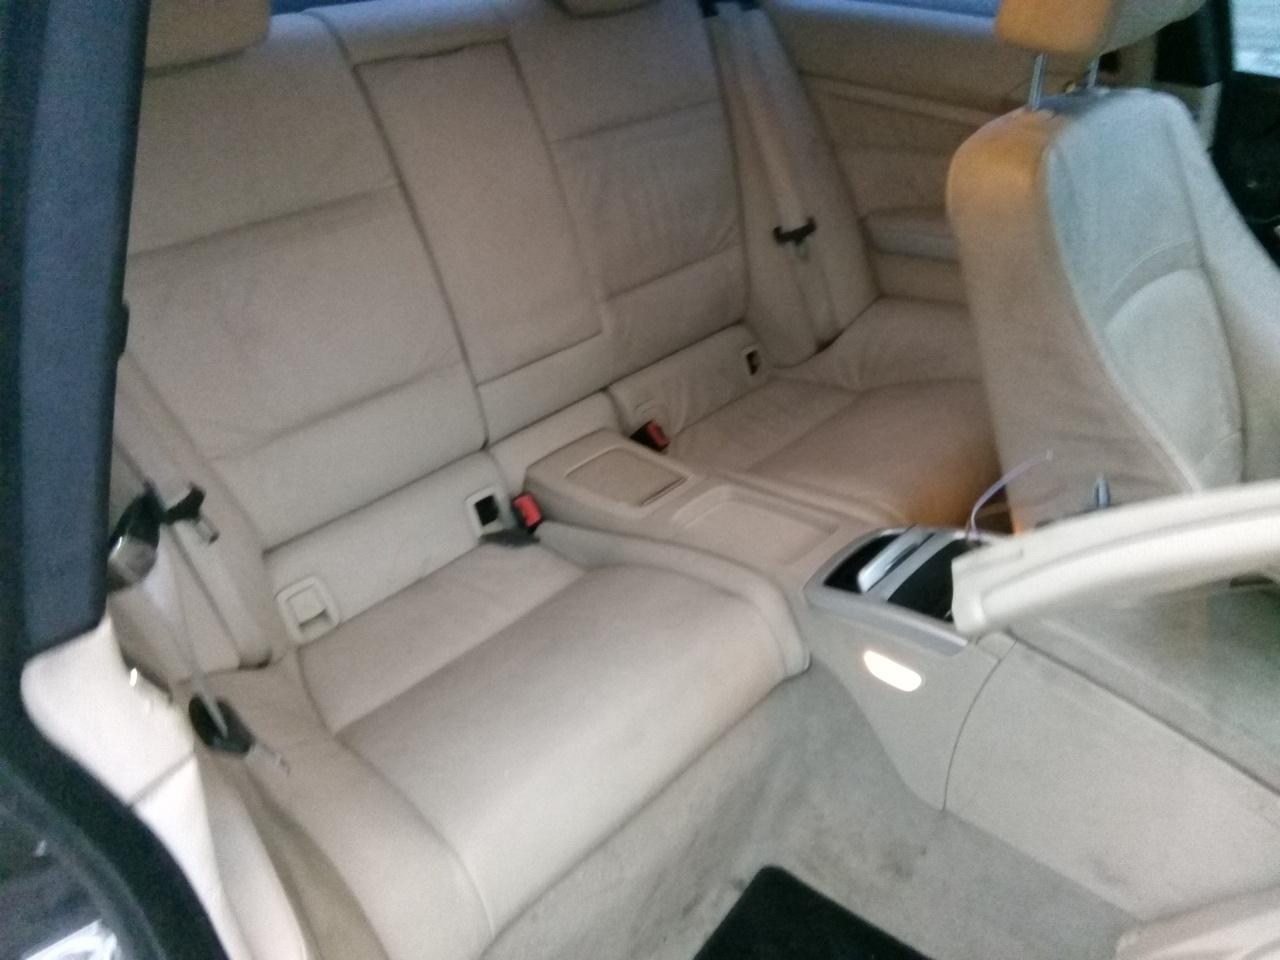 Dezmembrez e92 coupe pachet m de fabrica interior recaro